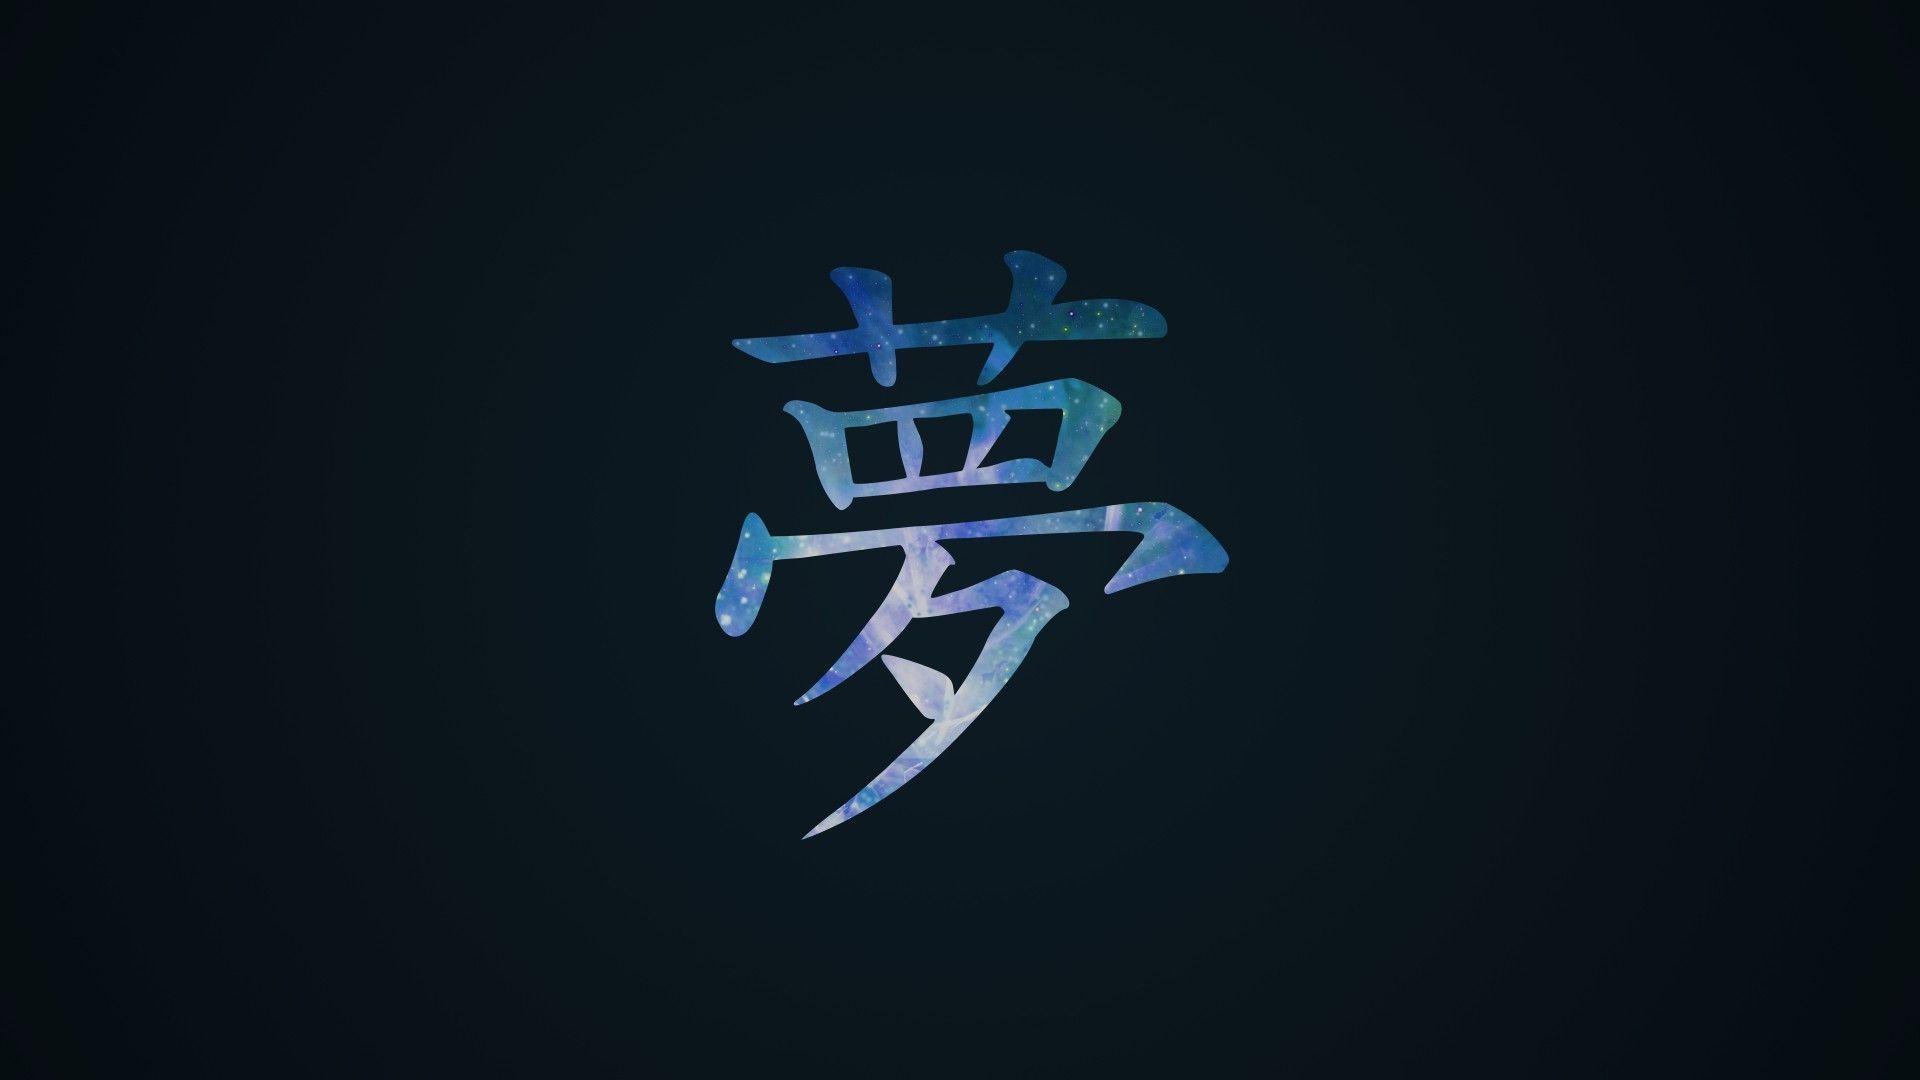 Chinese symbols wallpaper 57 images 1920x1080 symbol chinese wallpaper 1920x1080 213041 wallpaperup buycottarizona